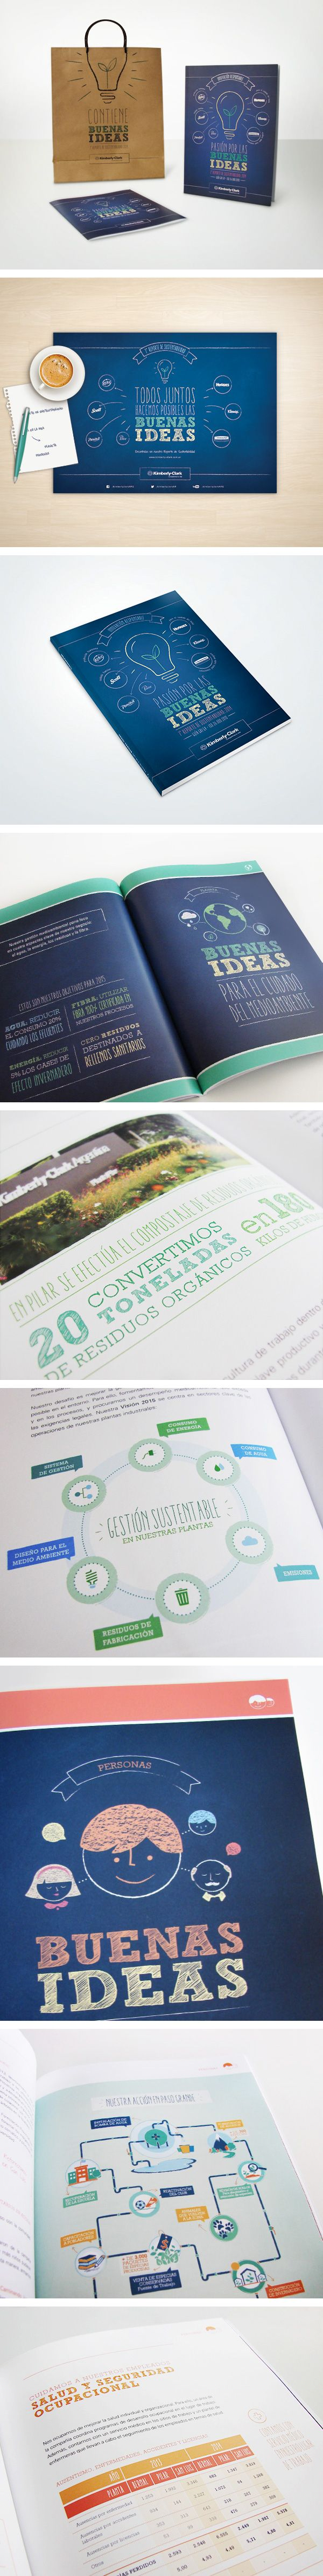 Editorial Design / Campaign Kimberly Clark: CSR Report 2014